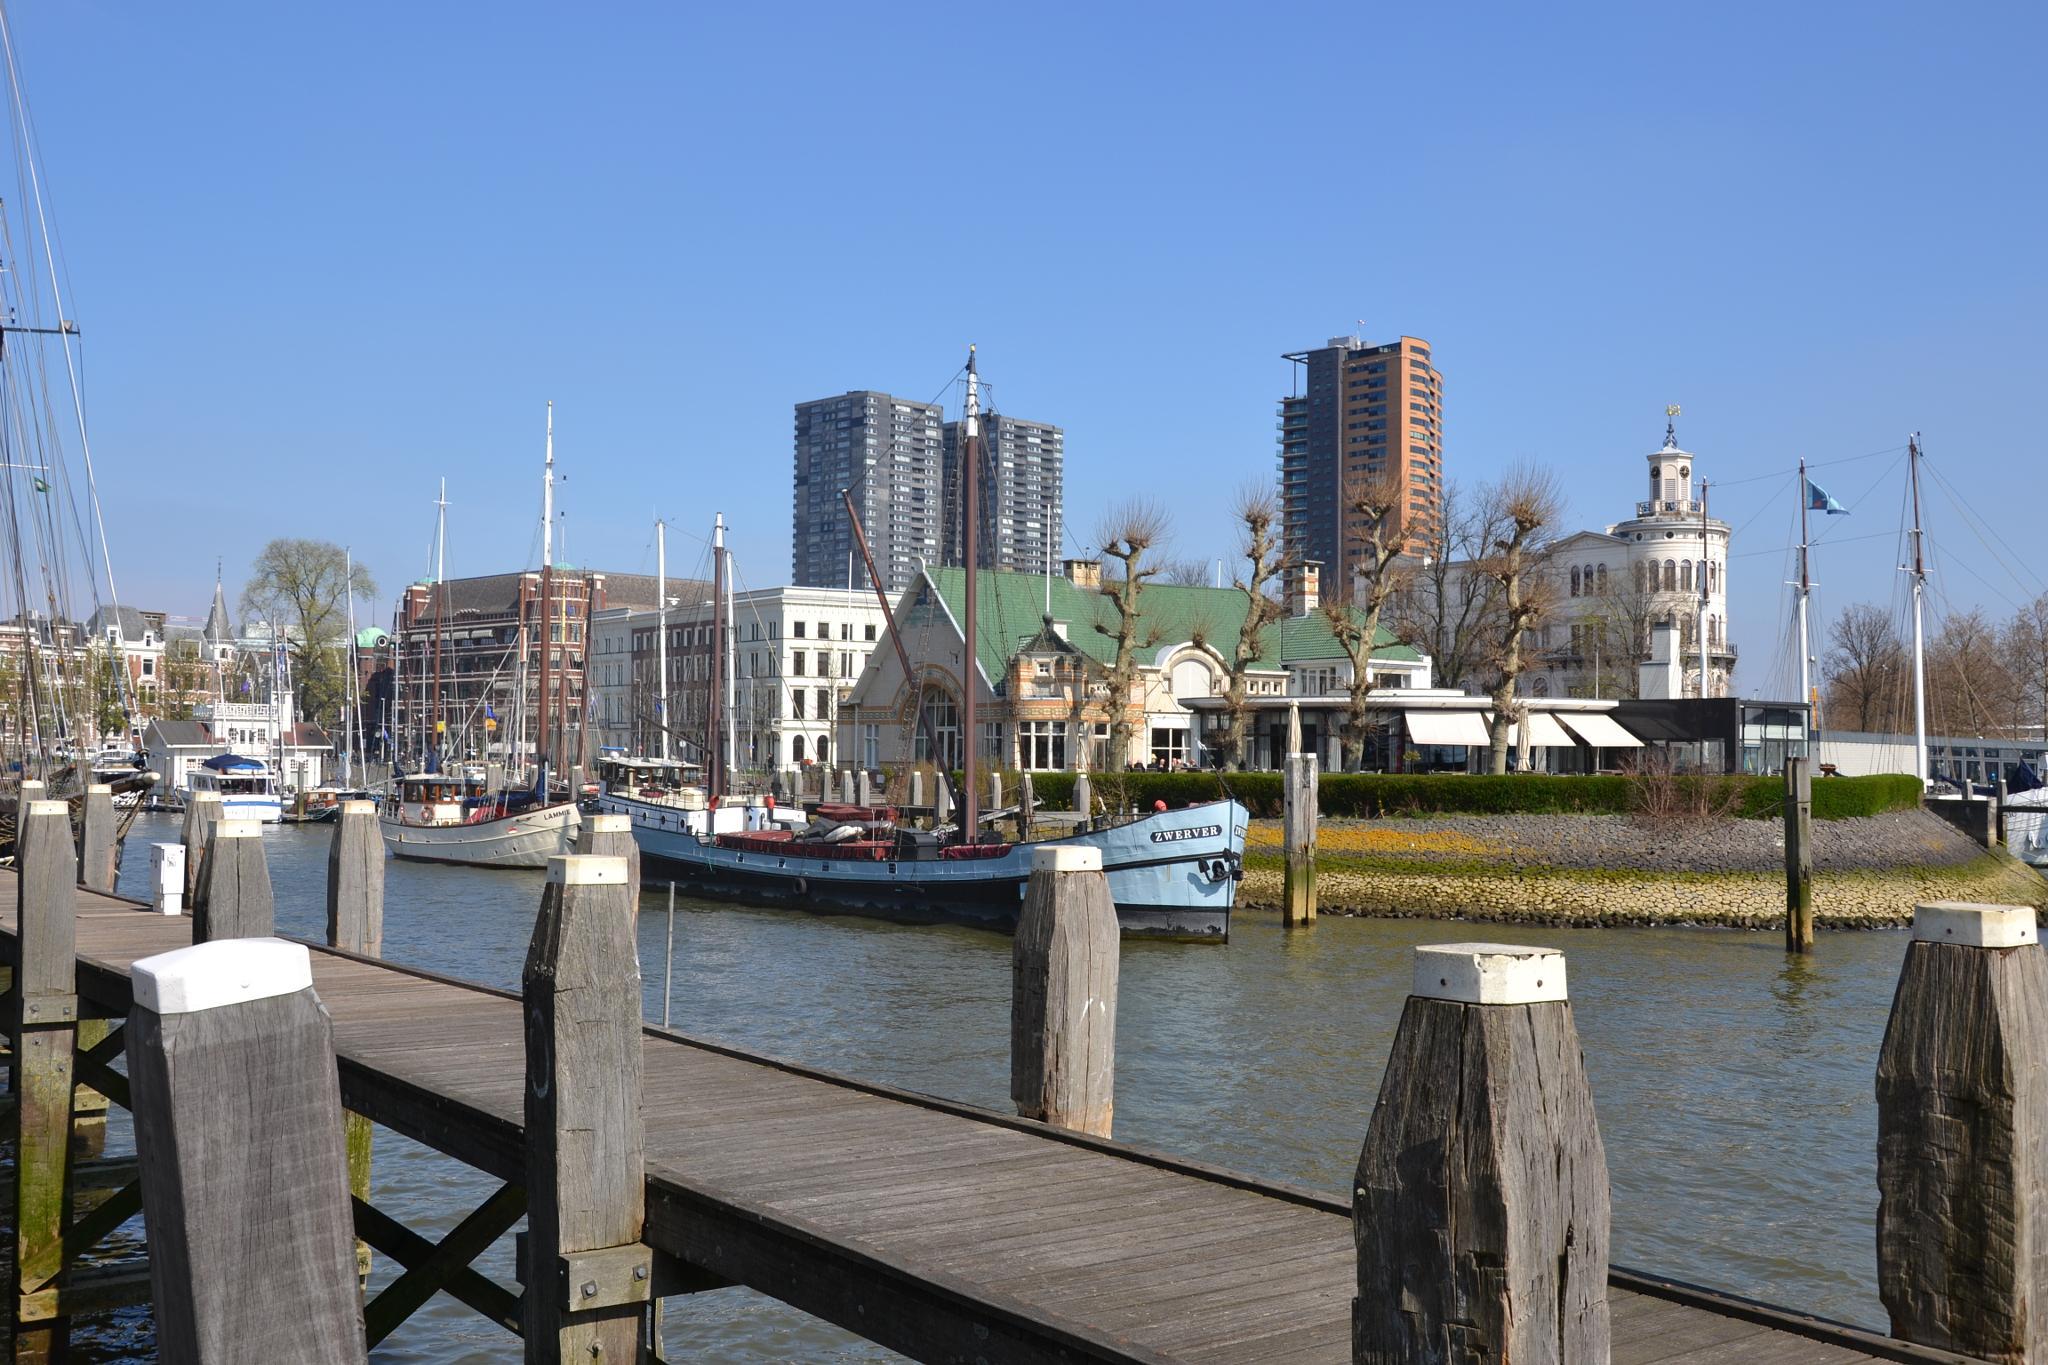 Puerto de Roterdam by xemariagil